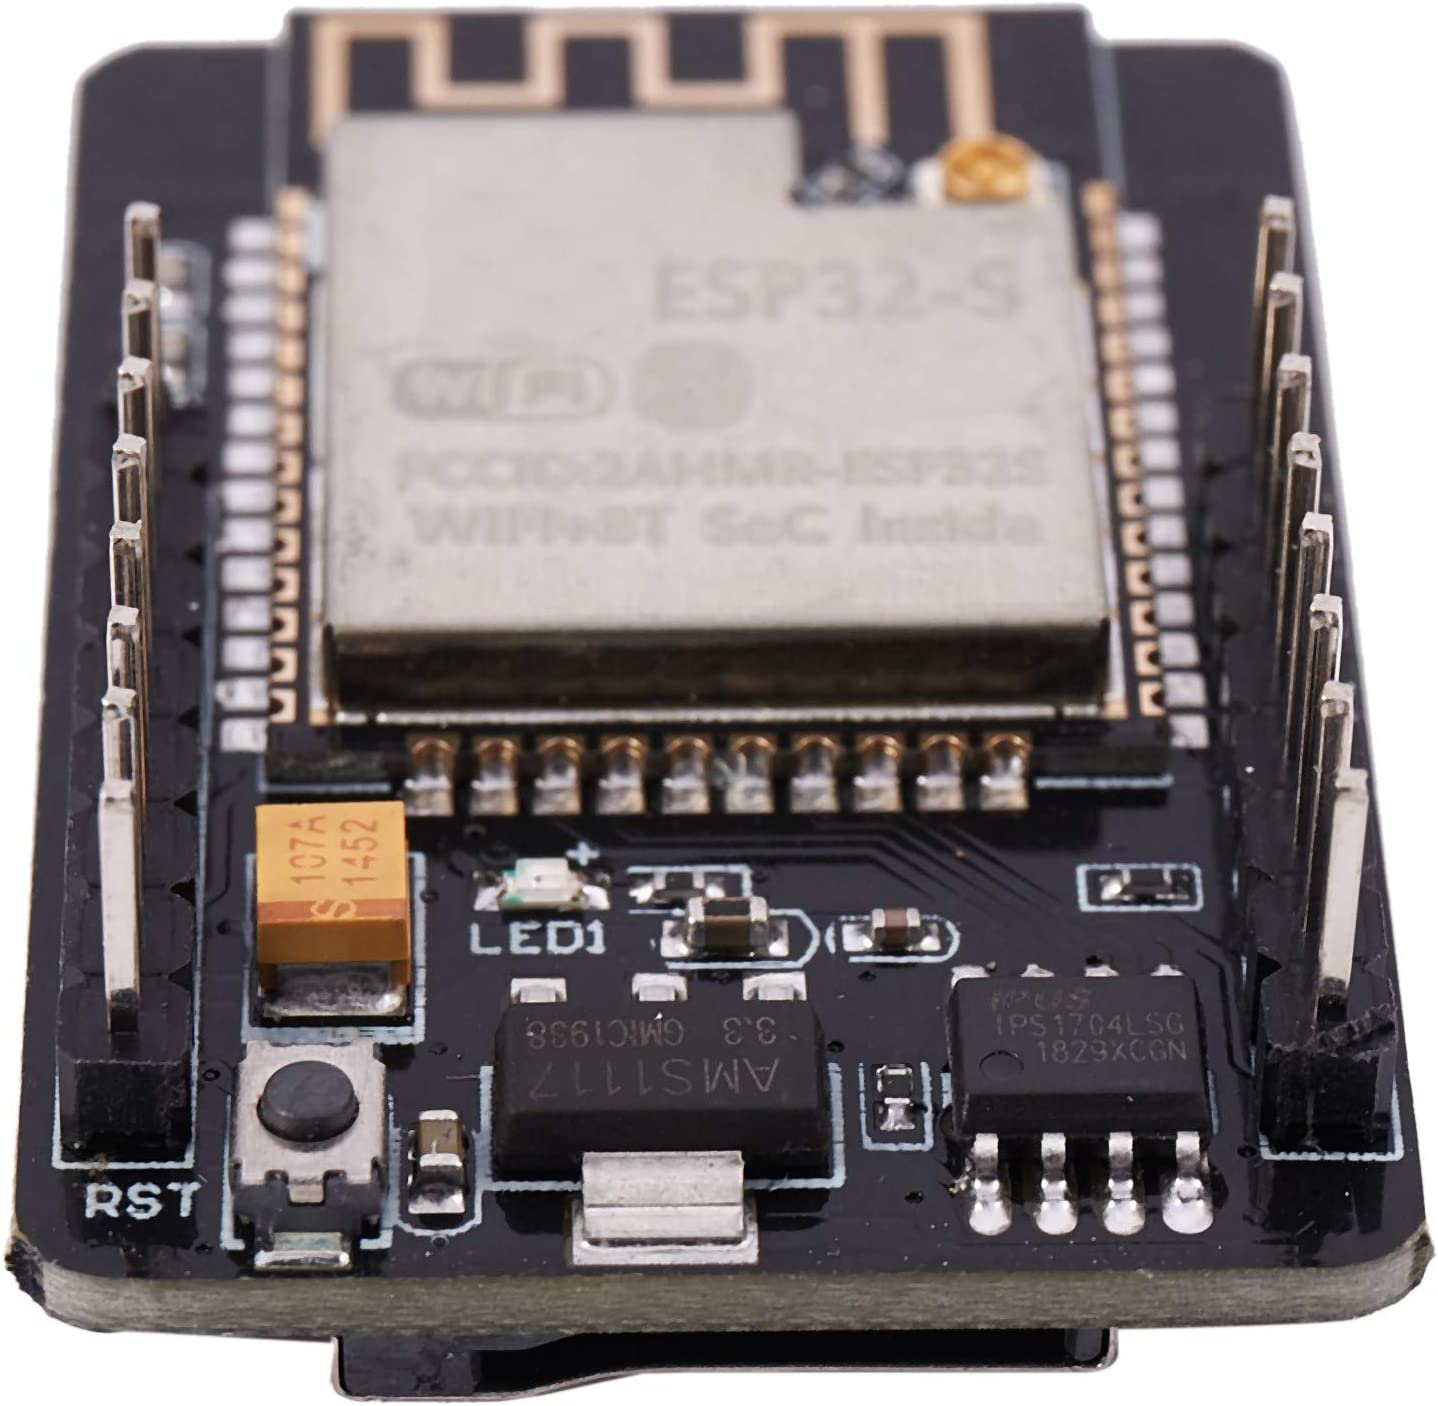 CUHAWUDBA Esp32-Cam Esp-32S WiFi Modul Esp32 Seriell Zu WiFi Esp32 Nocken Entwicklungs Board 5V Mit Ov2640 Kamera Modul